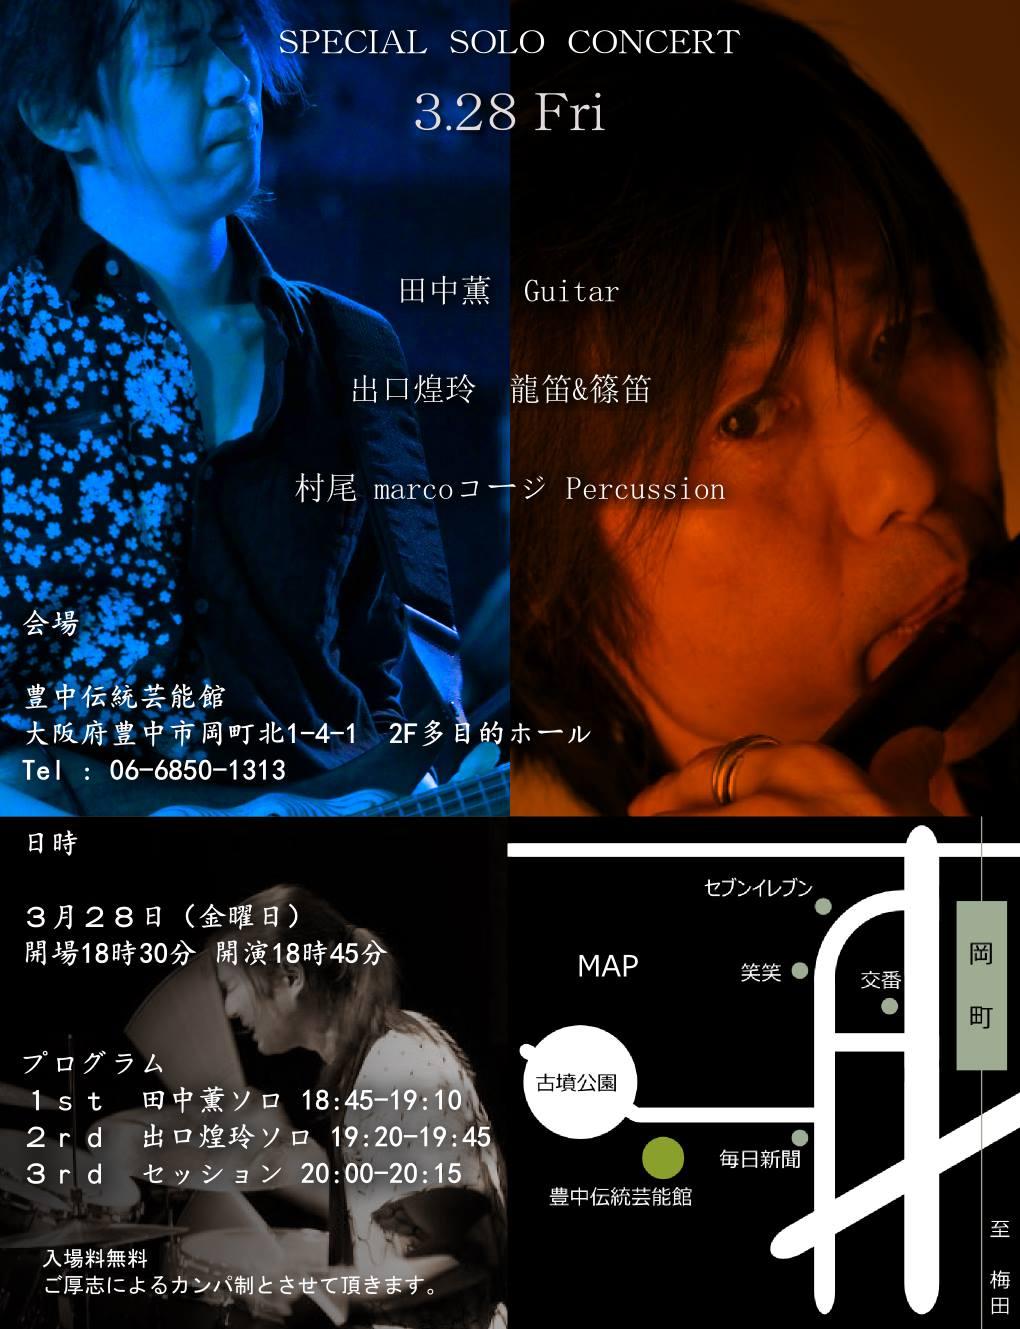 140328-special-solo-concert